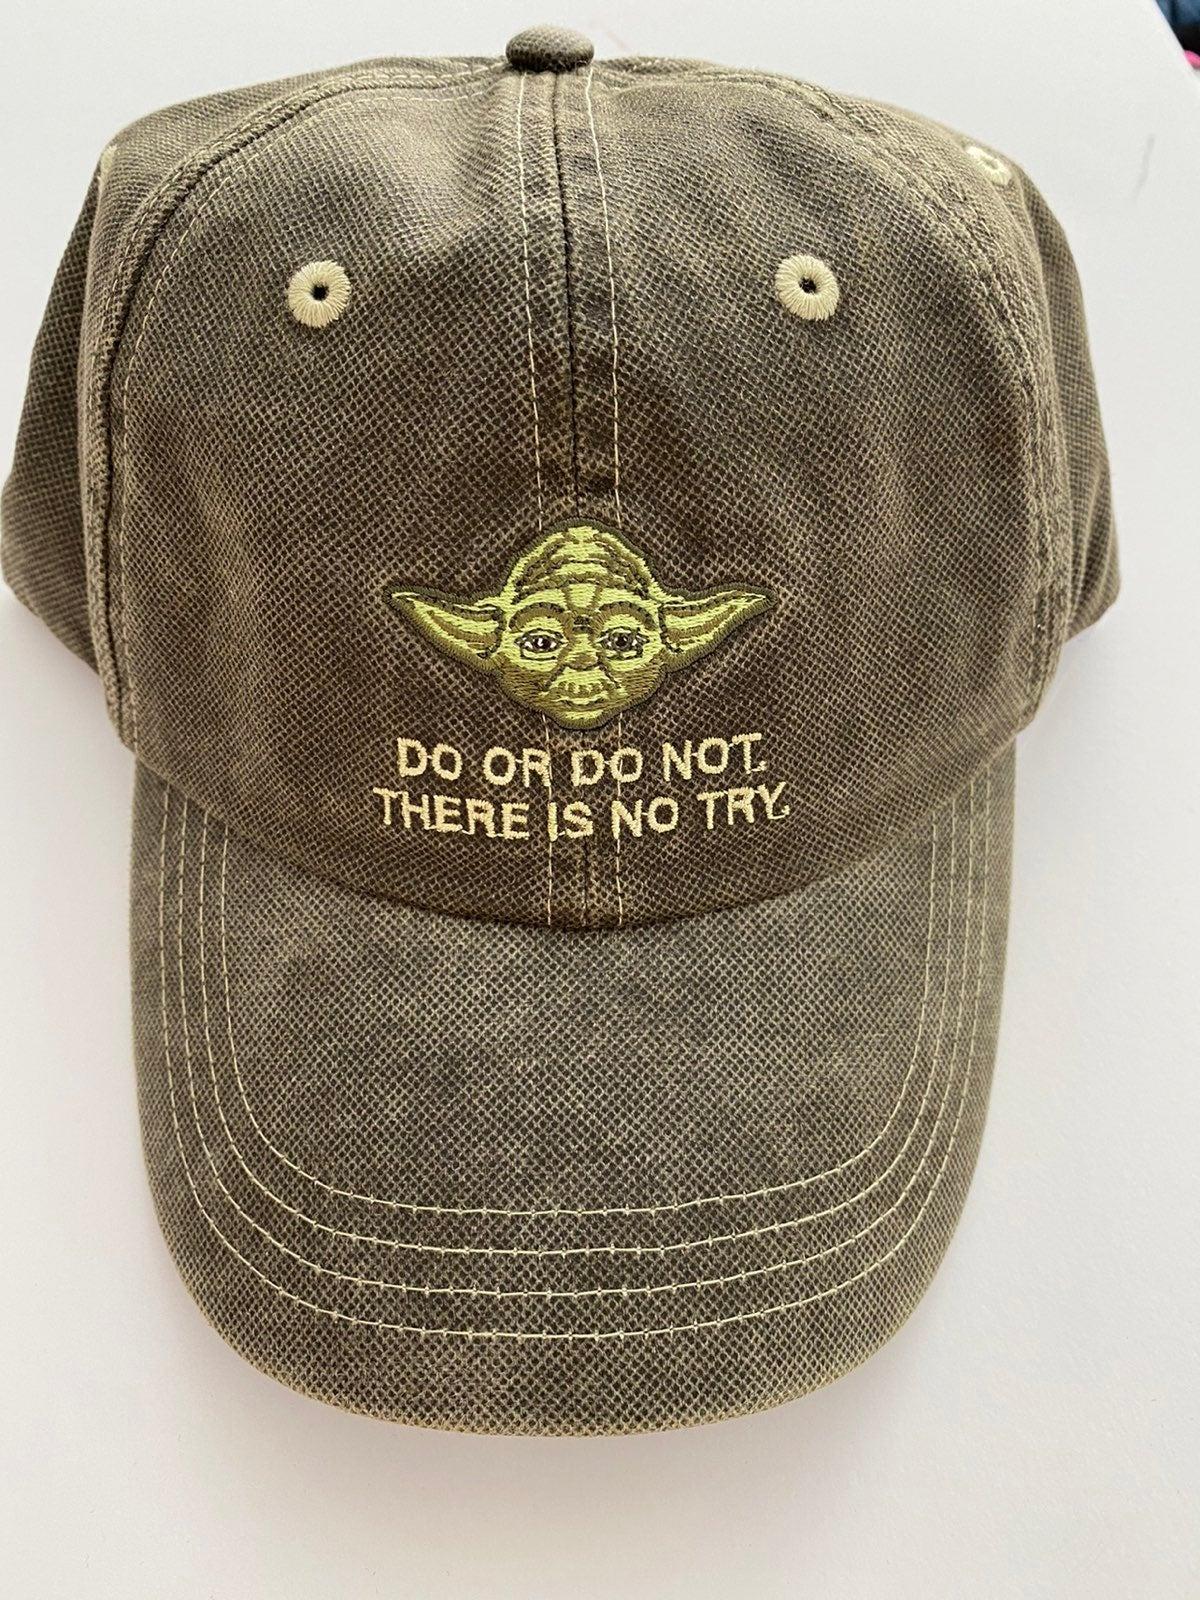 Star Wars Yoda Disneyland Hat